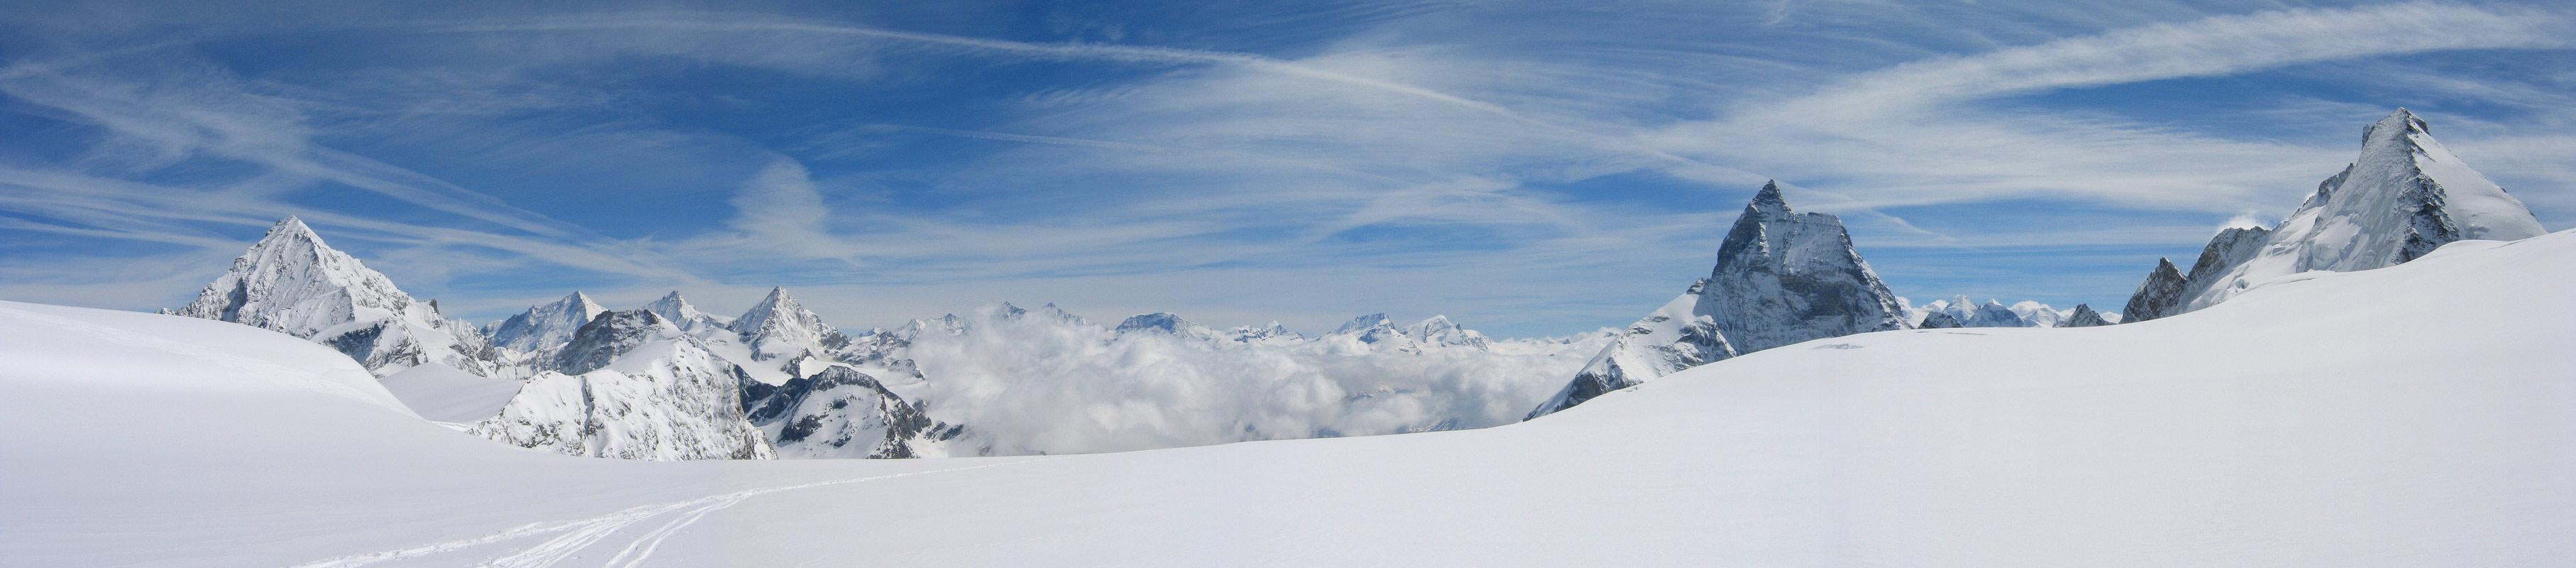 Col Valpelline, Day 6 H.R. Chamonix-Zermatt Walliser Alpen / Alpes valaisannes Švýcarsko panorama 52